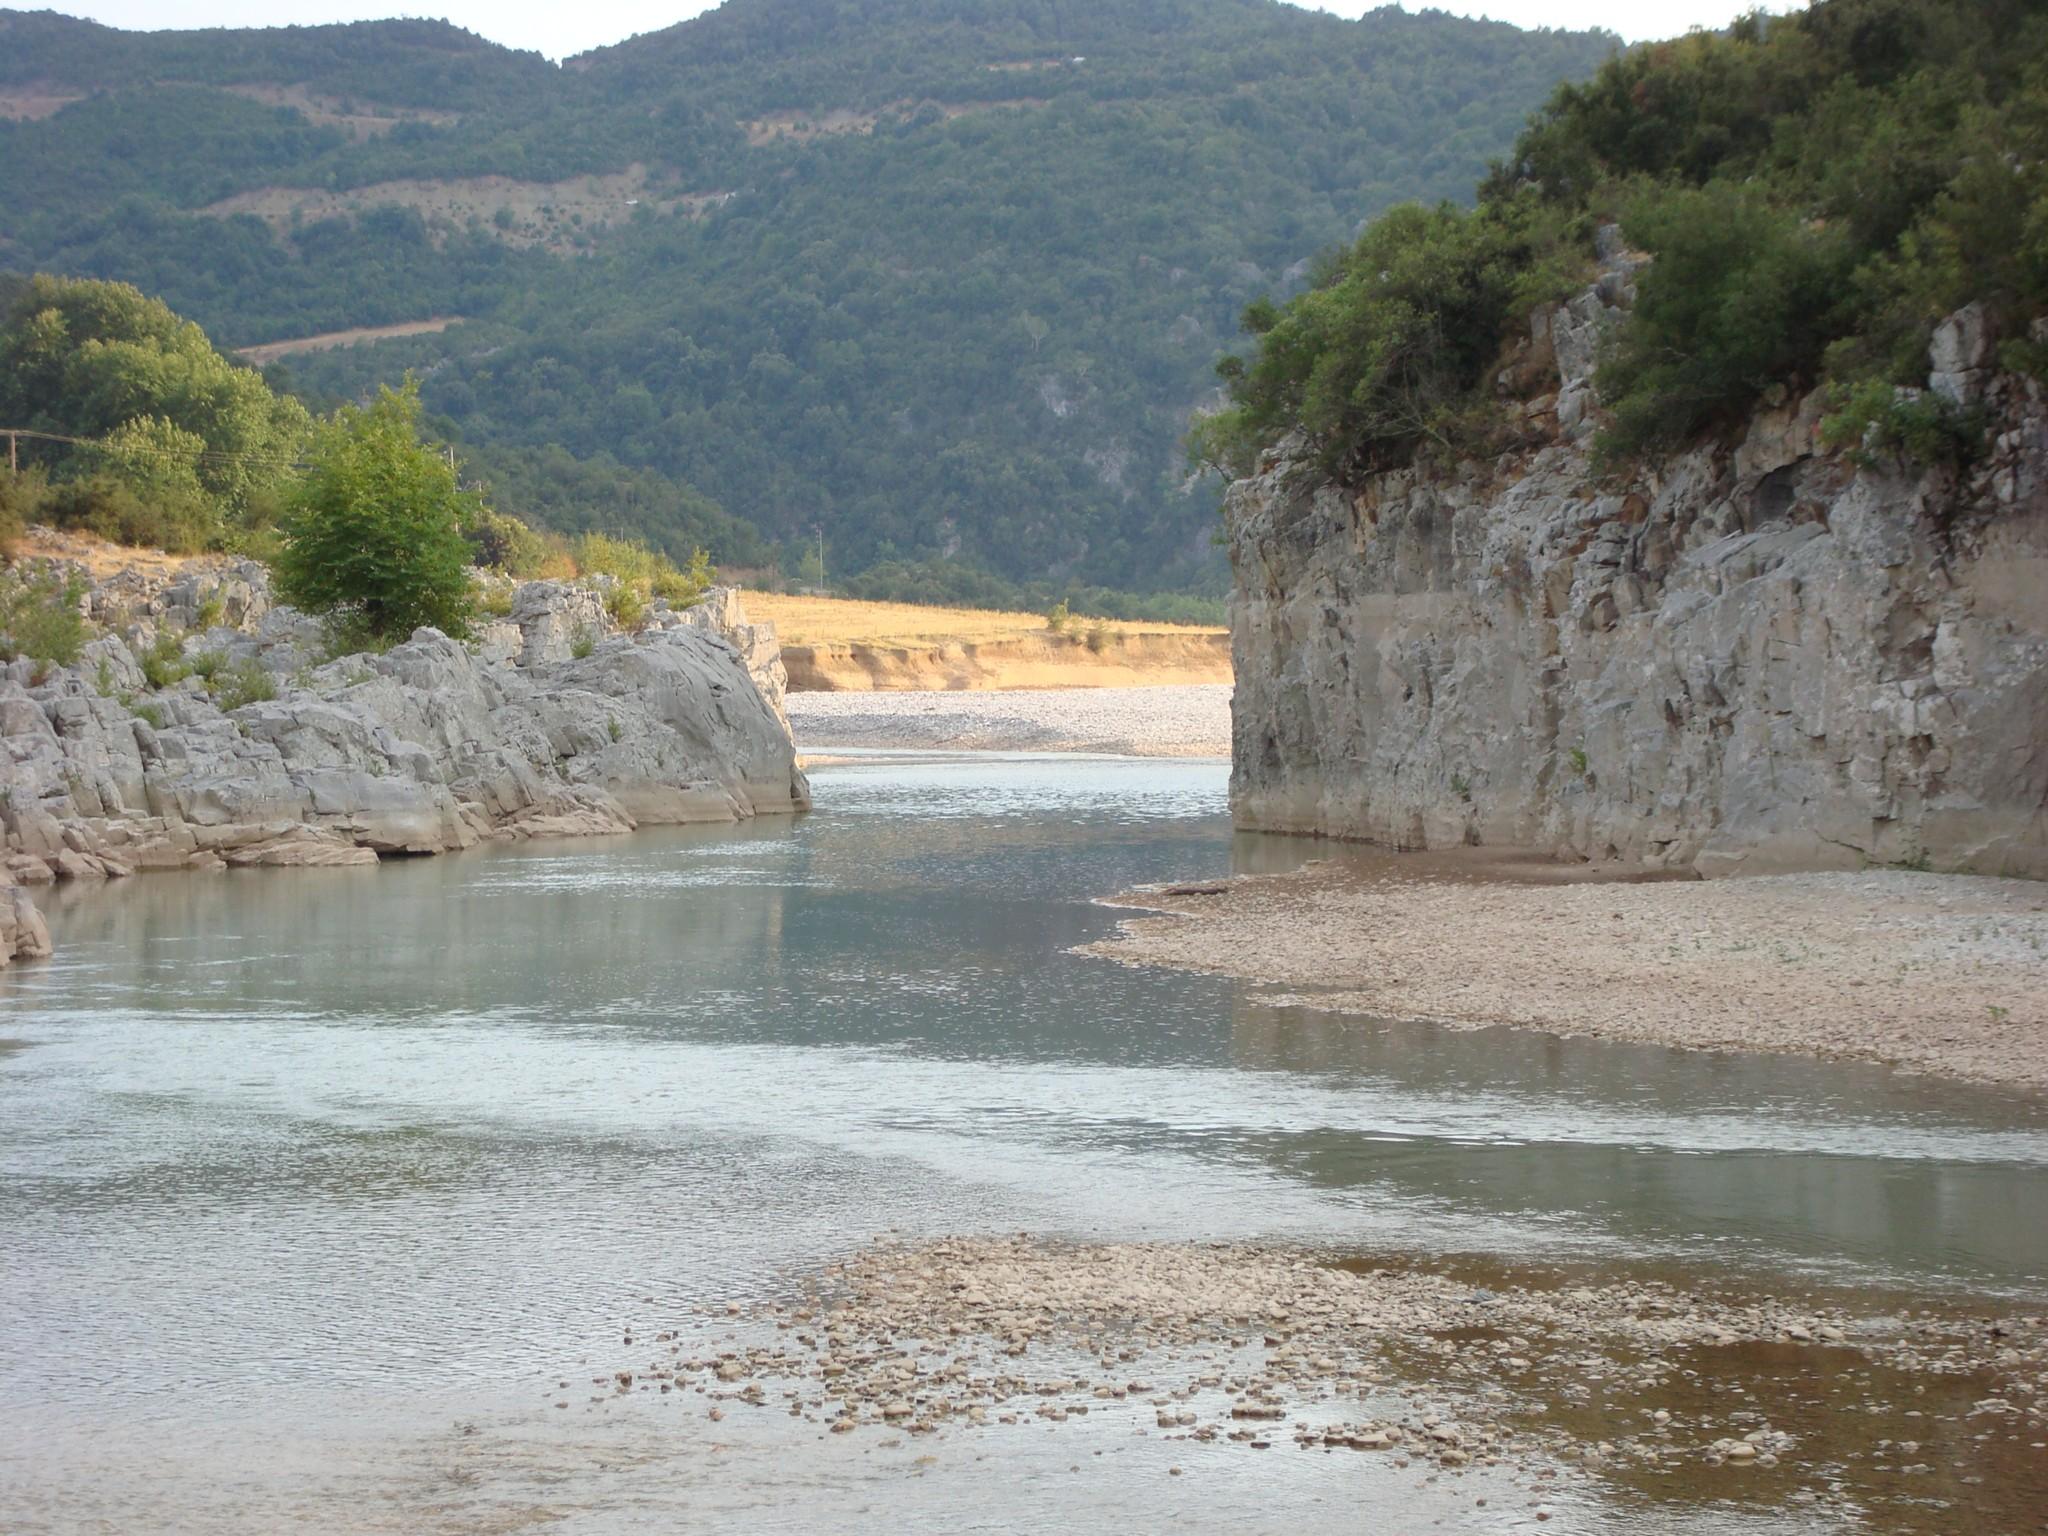 File:Acheloos river narrows 02.jpg